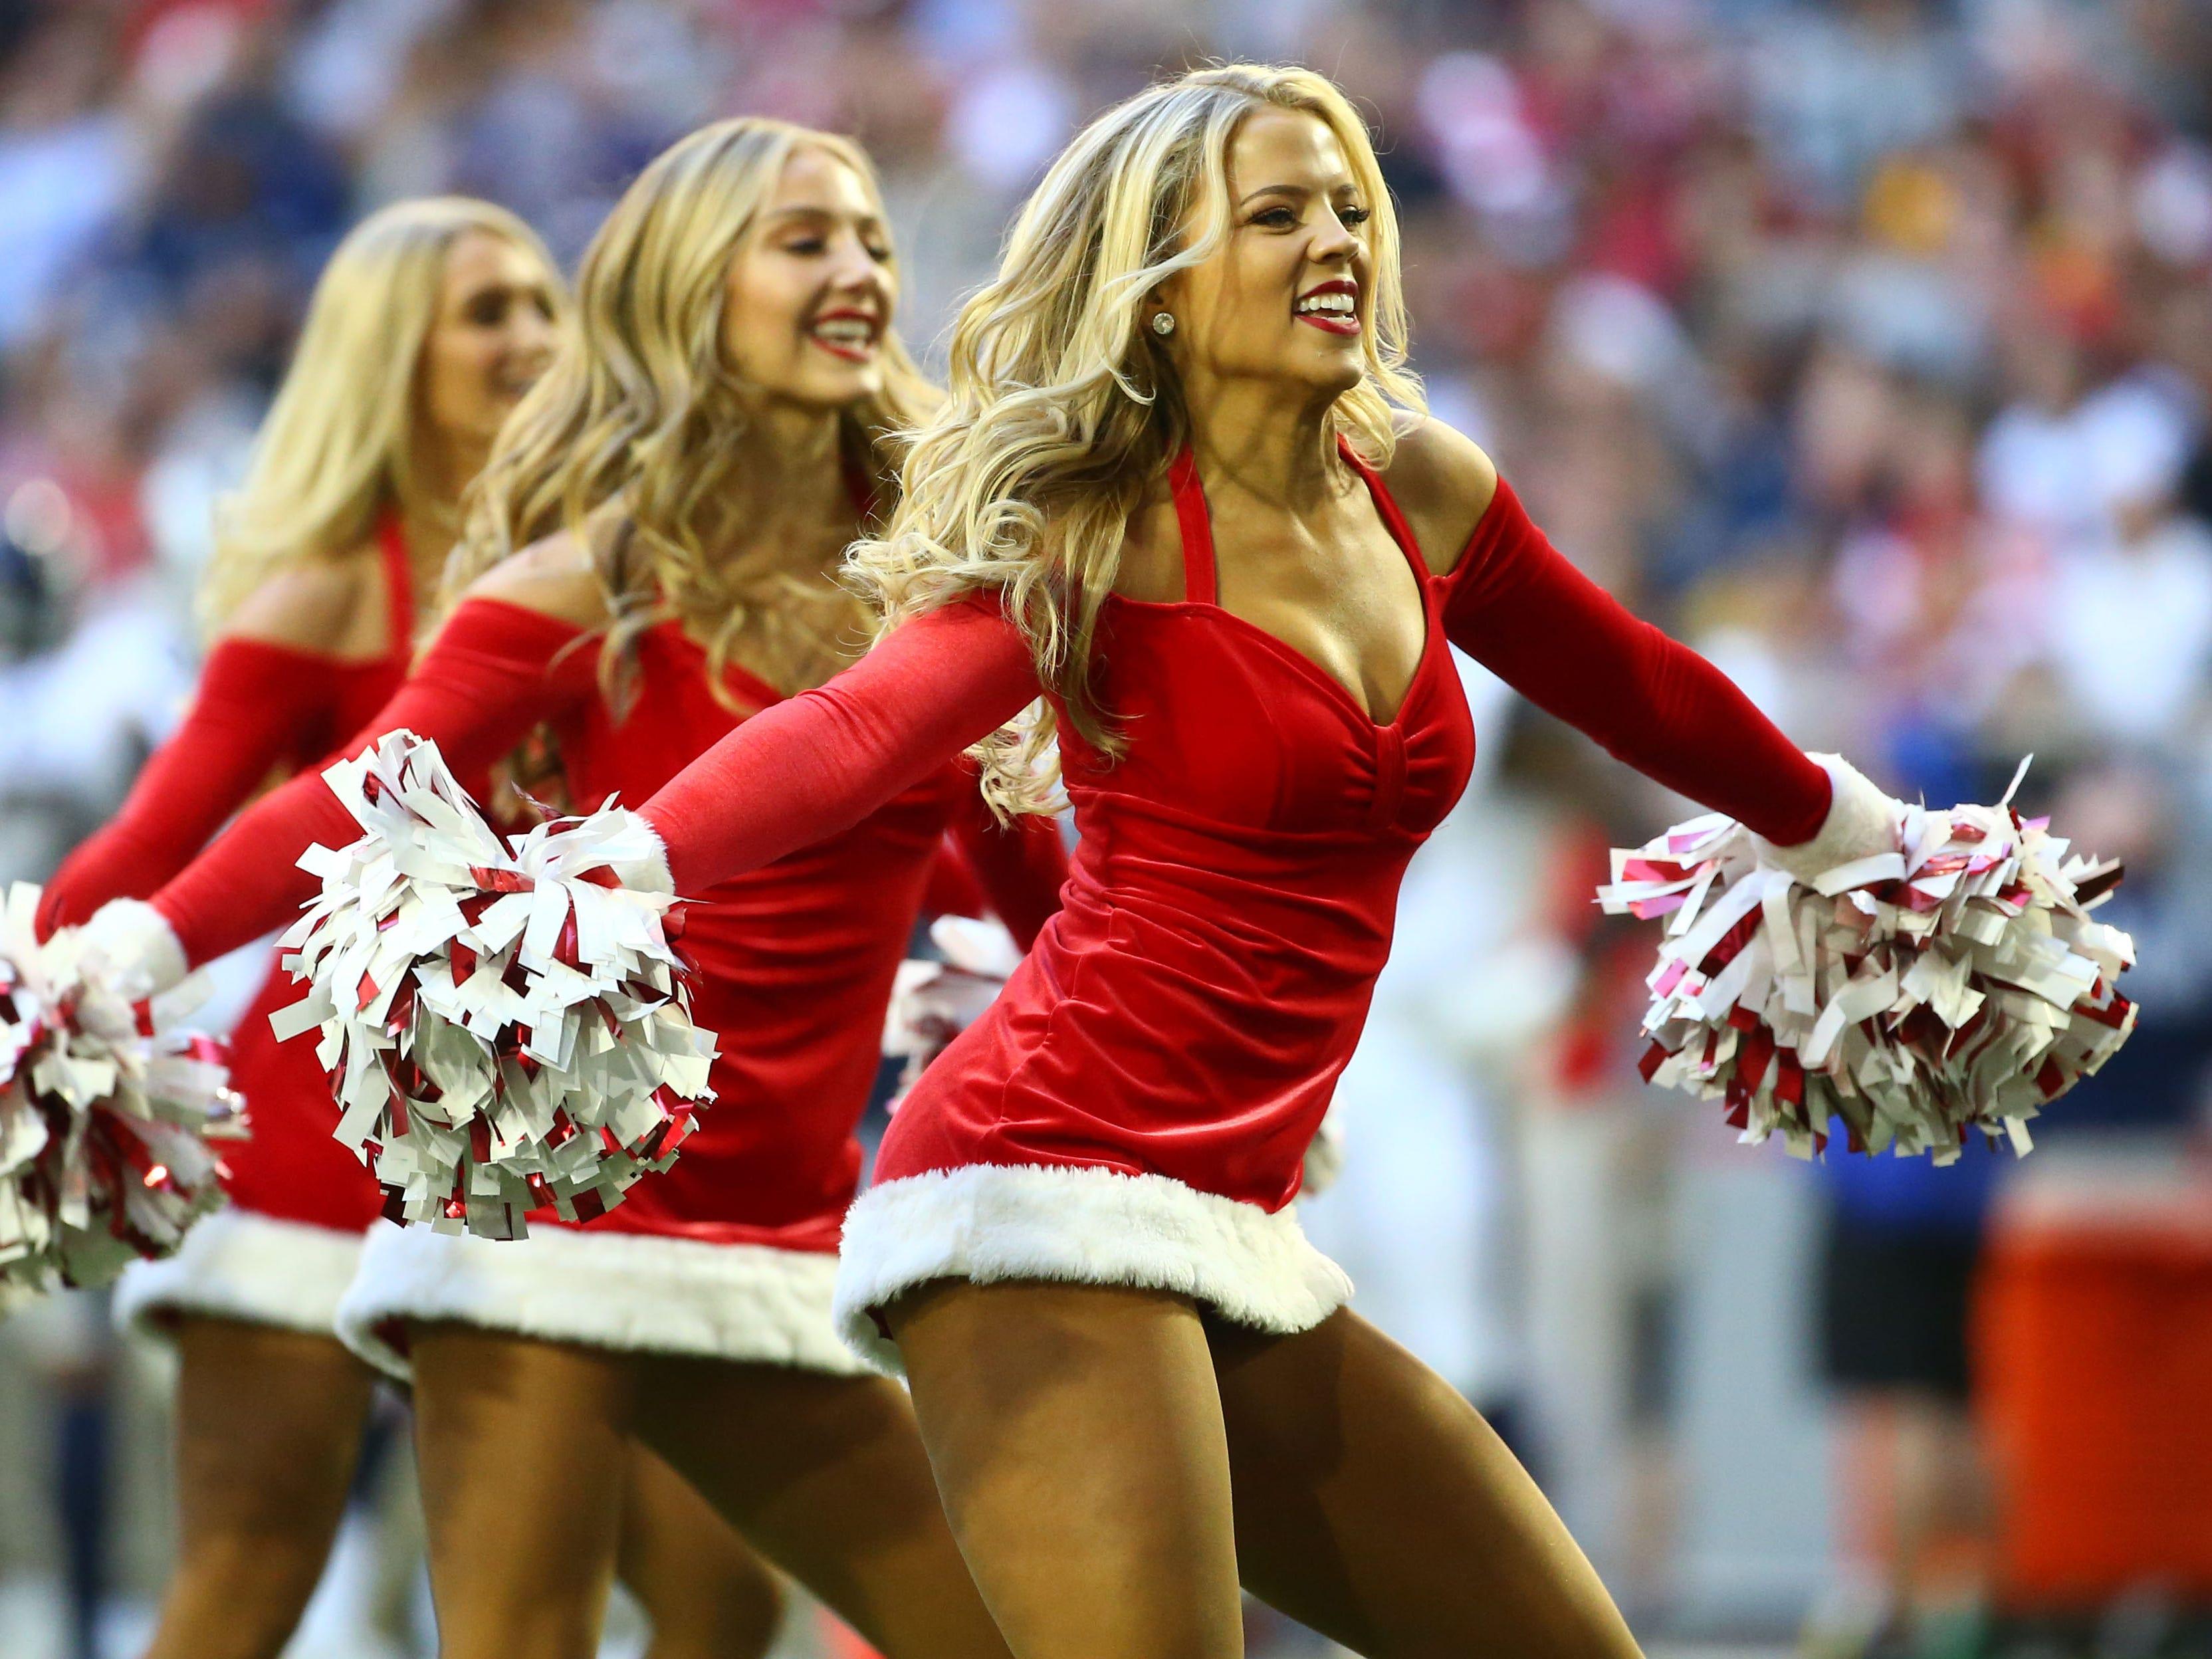 Arizona Cardinals cheerleaders perform in the second half on Dec. 23 at State Farm Stadium.